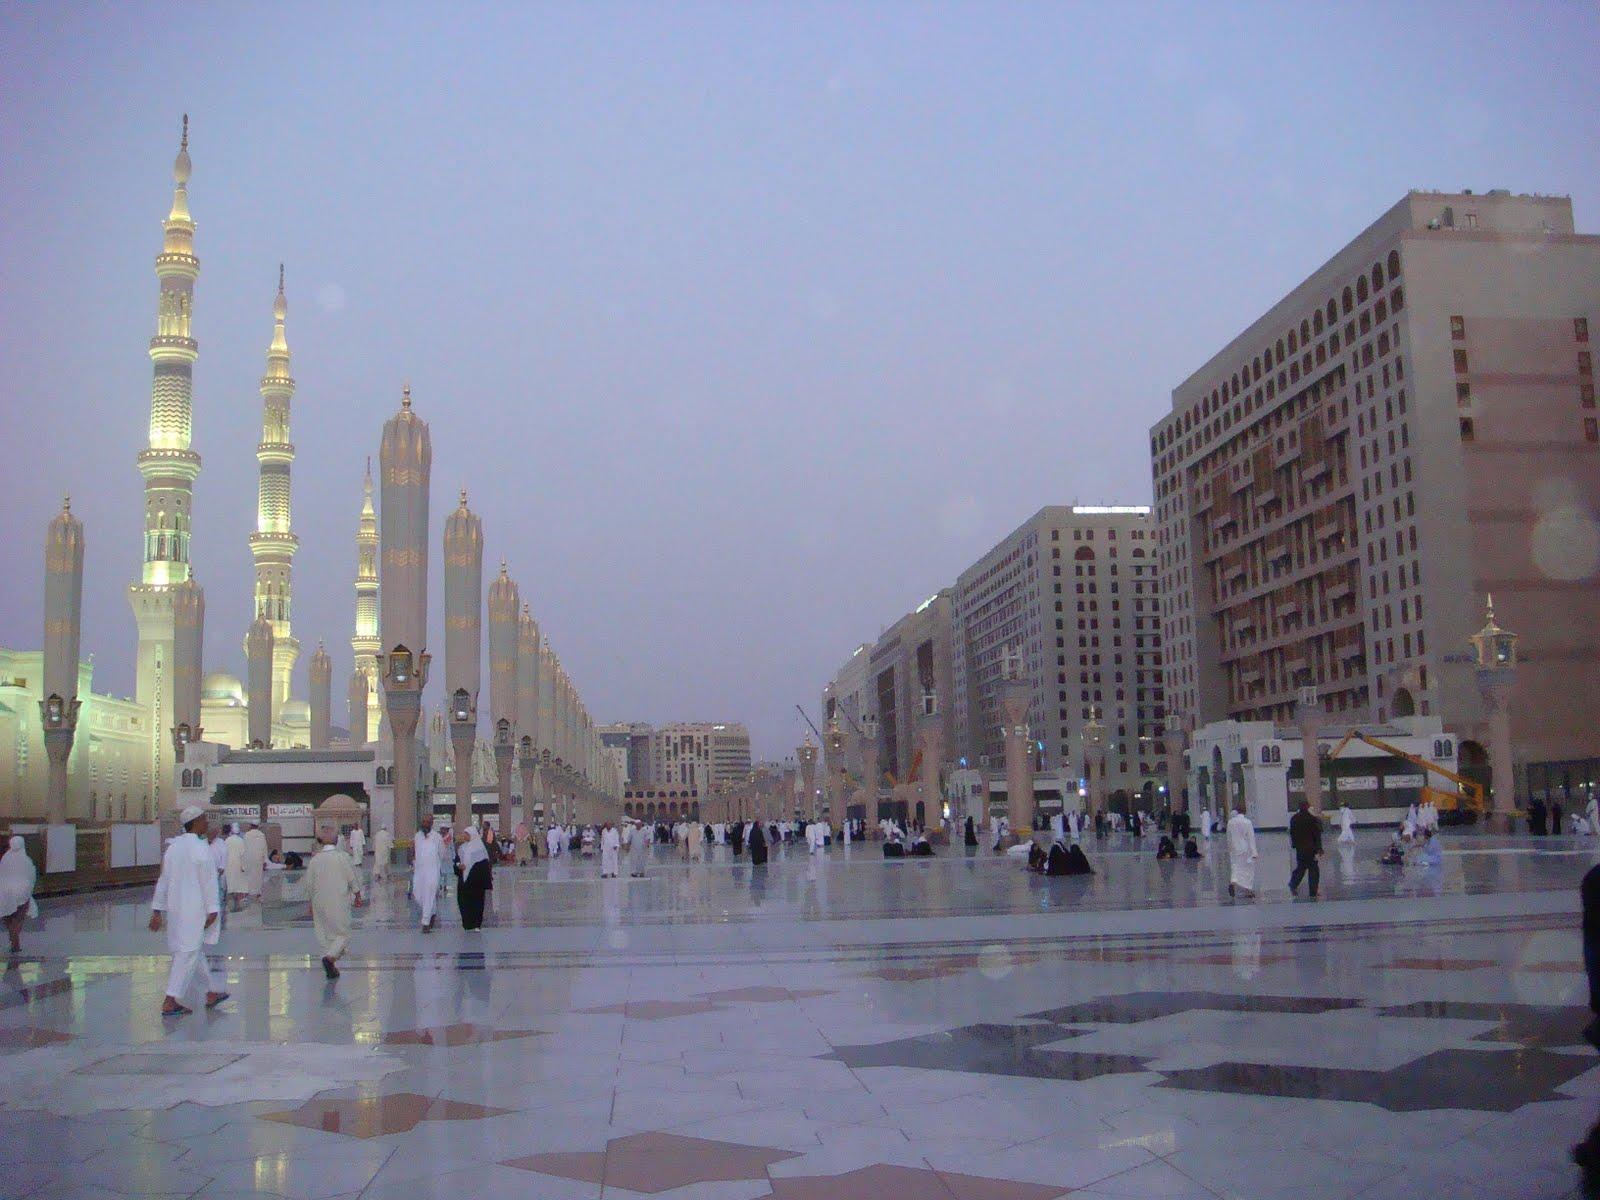 Wan S Footprints The World Mecca And Medina Saudi Arabia